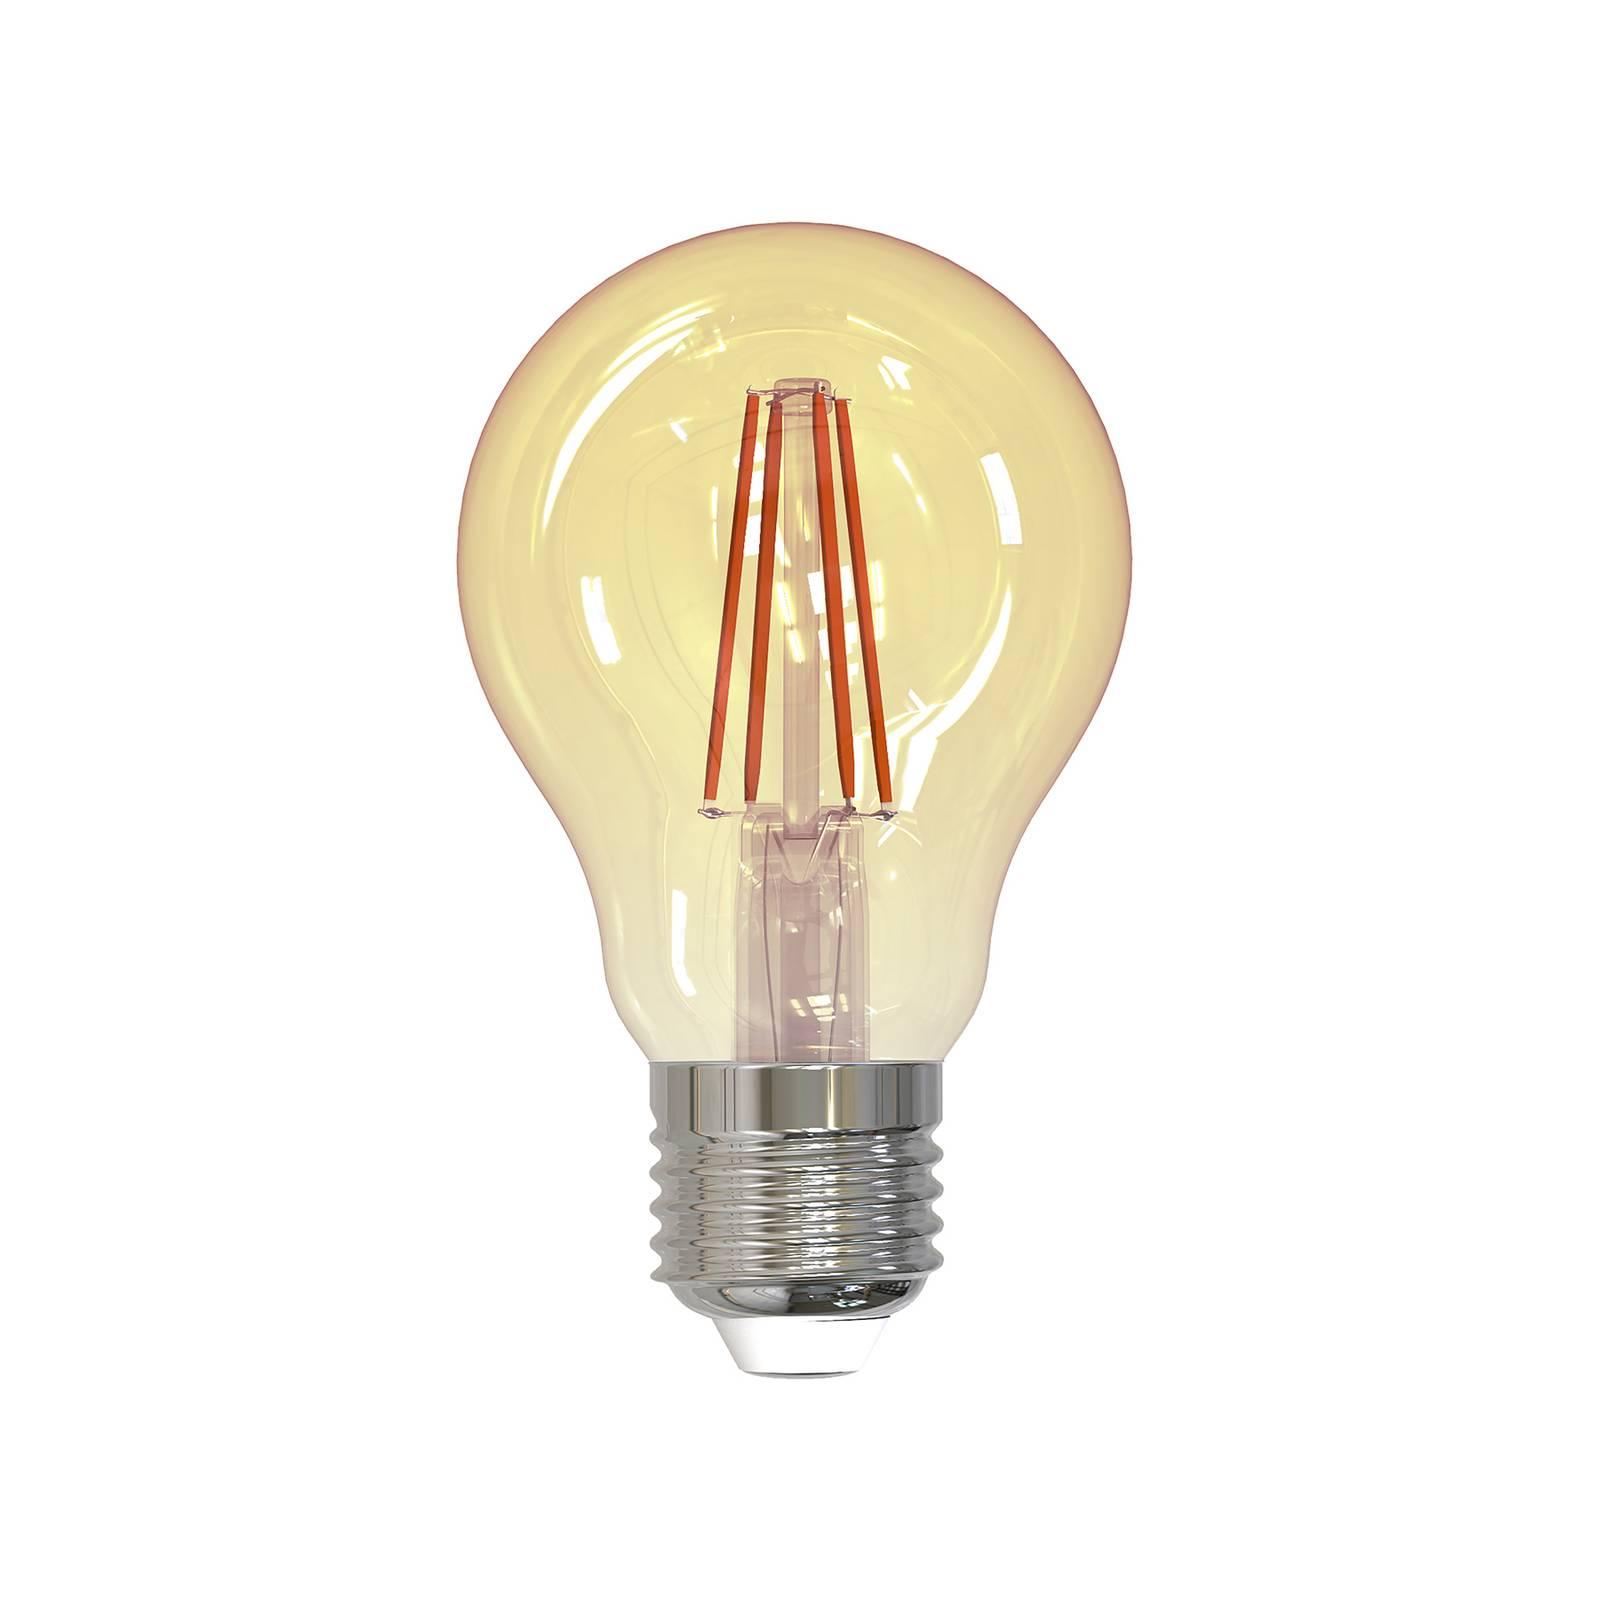 LED-filamenttilamppu E27 4,5W 2 000 K 400 lm kulta